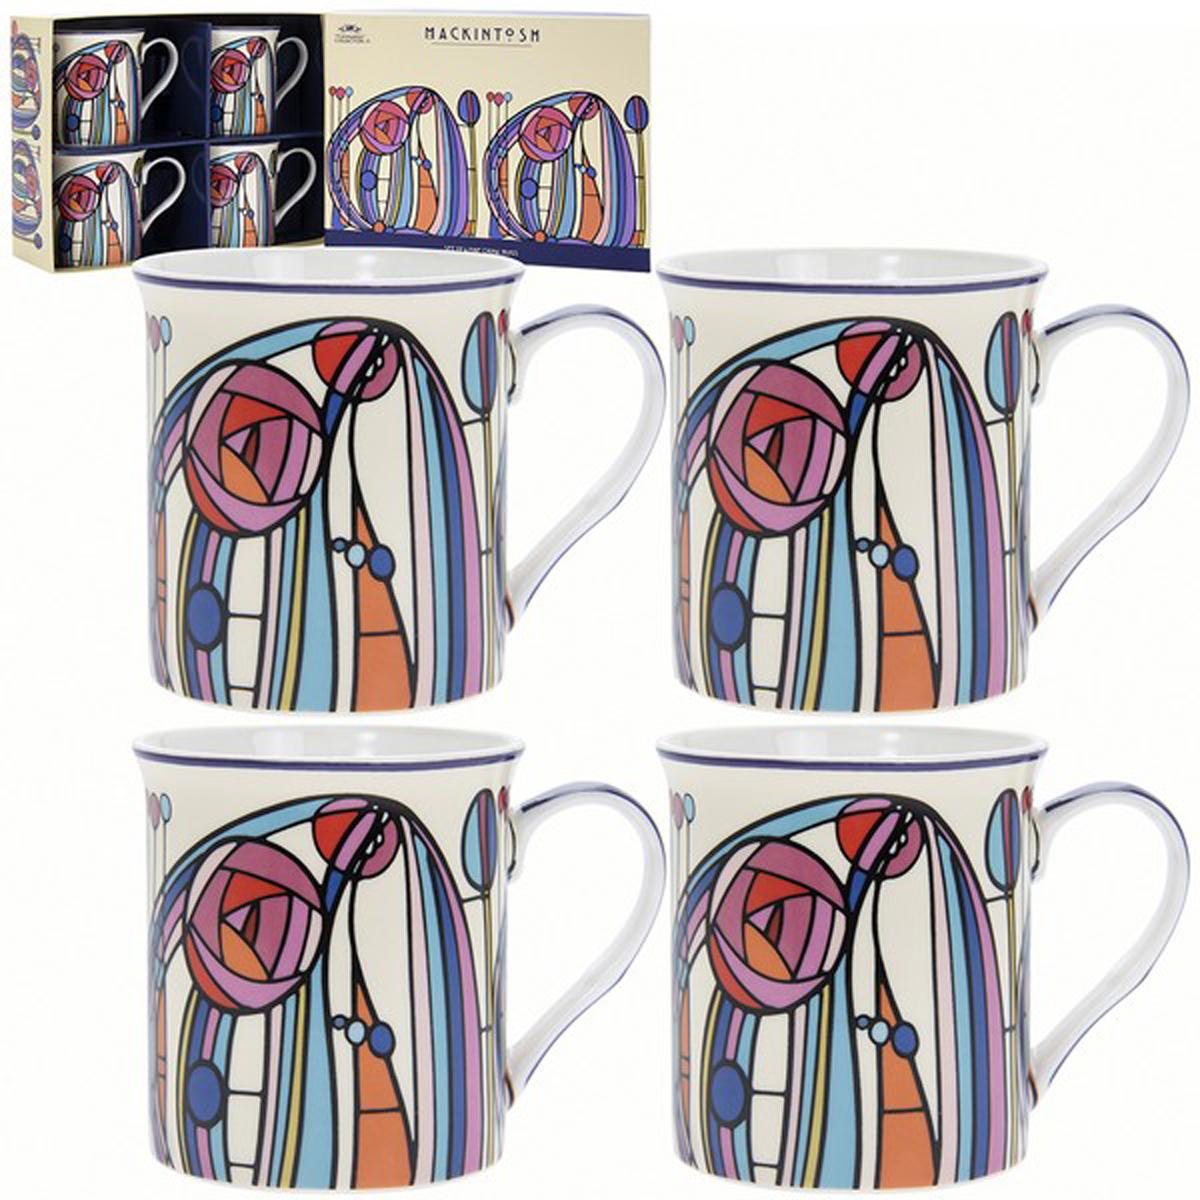 Coffret mugs porcelaine \'Mackintosh\' multicolore (4 mugs) - 85x85 mm  - [R1771]